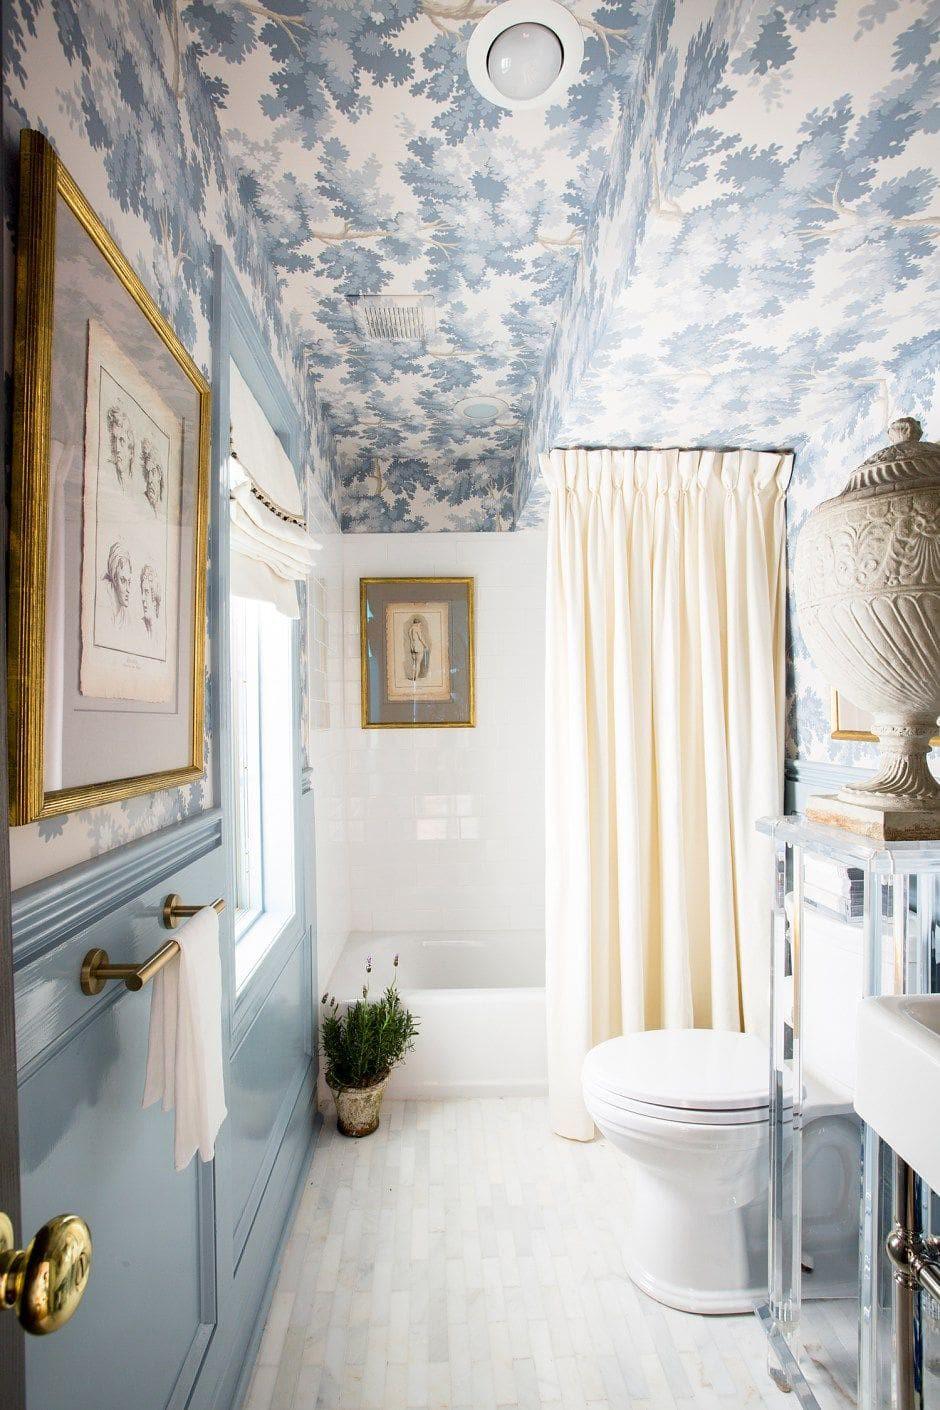 Pale Blue Wallpaper Ceiling | Southern Inspired Antique Bathroom Inspiration | Powder Blue Bathroom